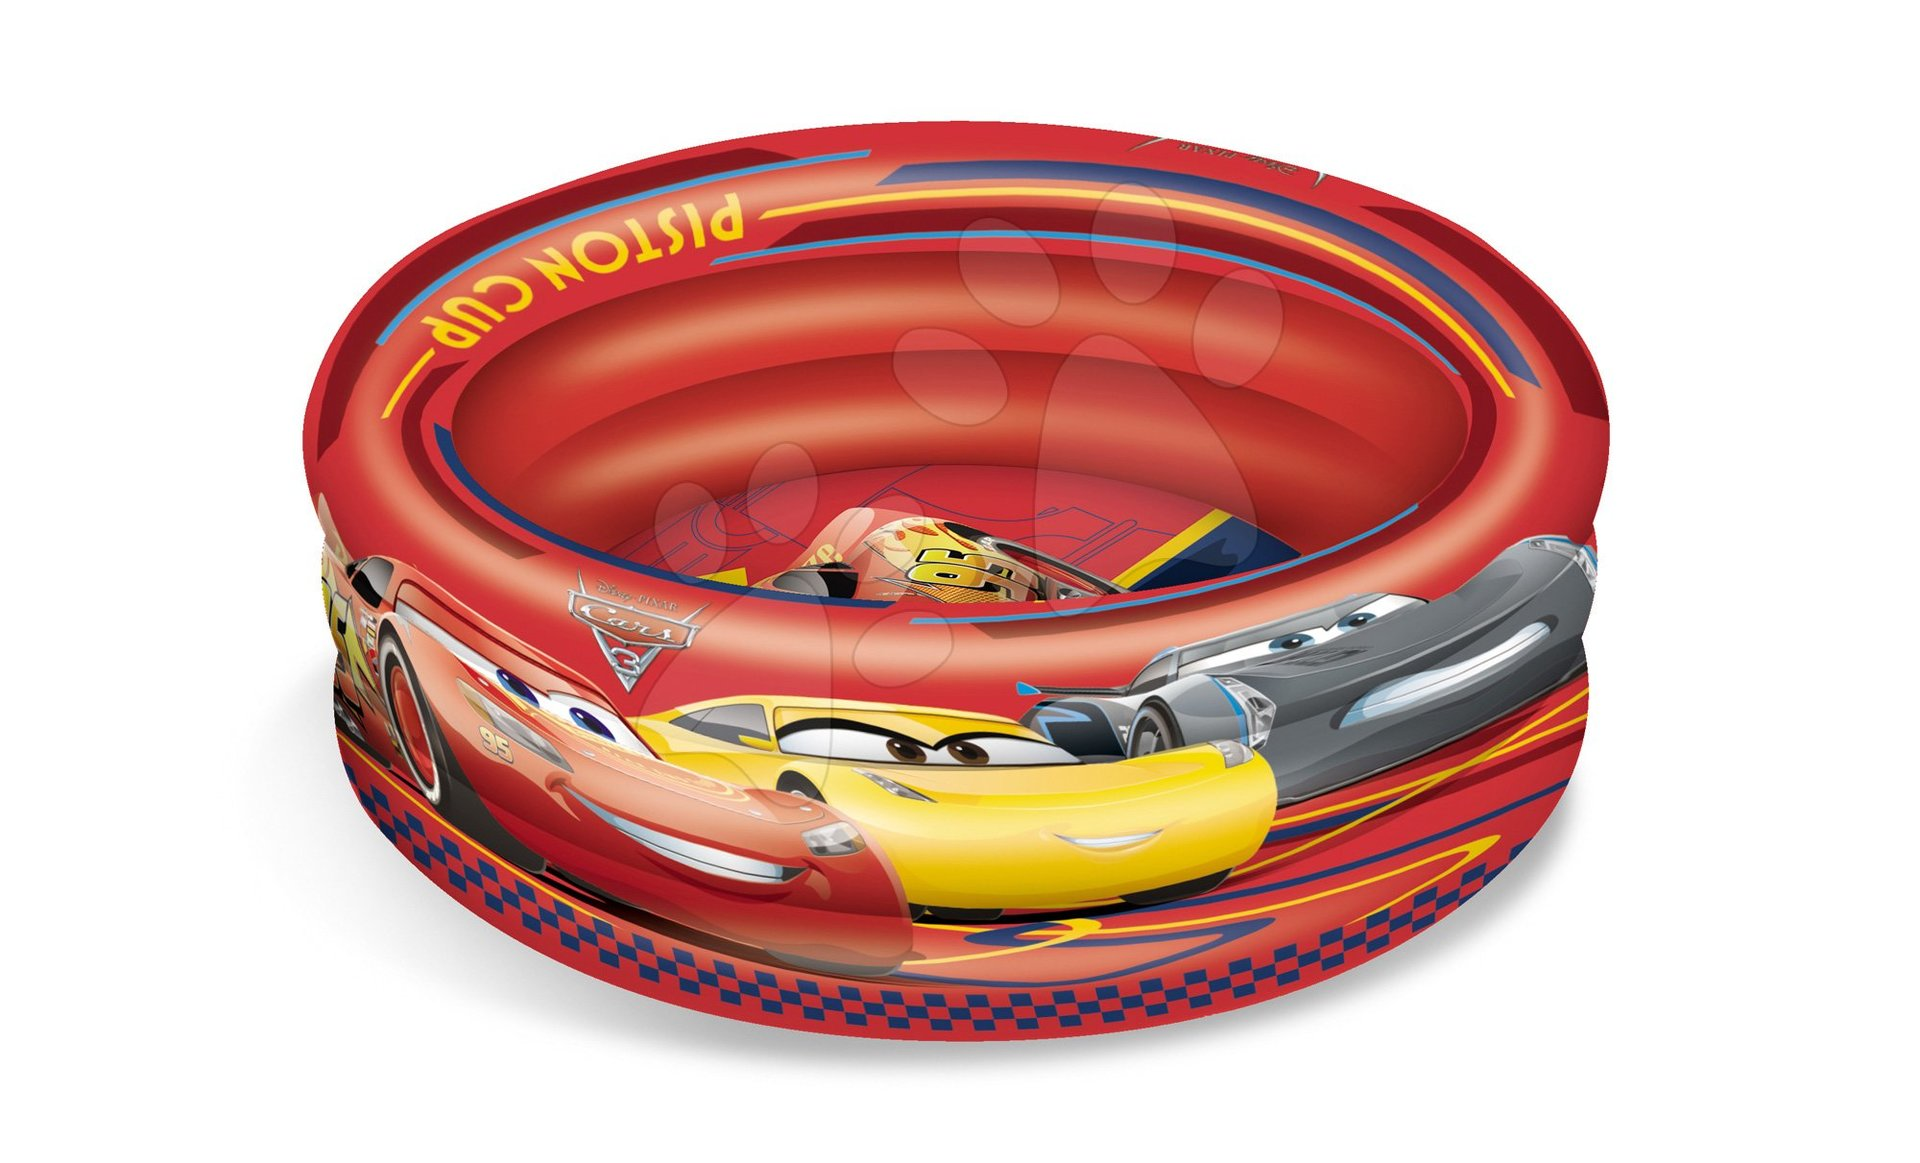 Detské bazéniky - Trojkomorový nafukovací bazén Cars Mondo 100 cm